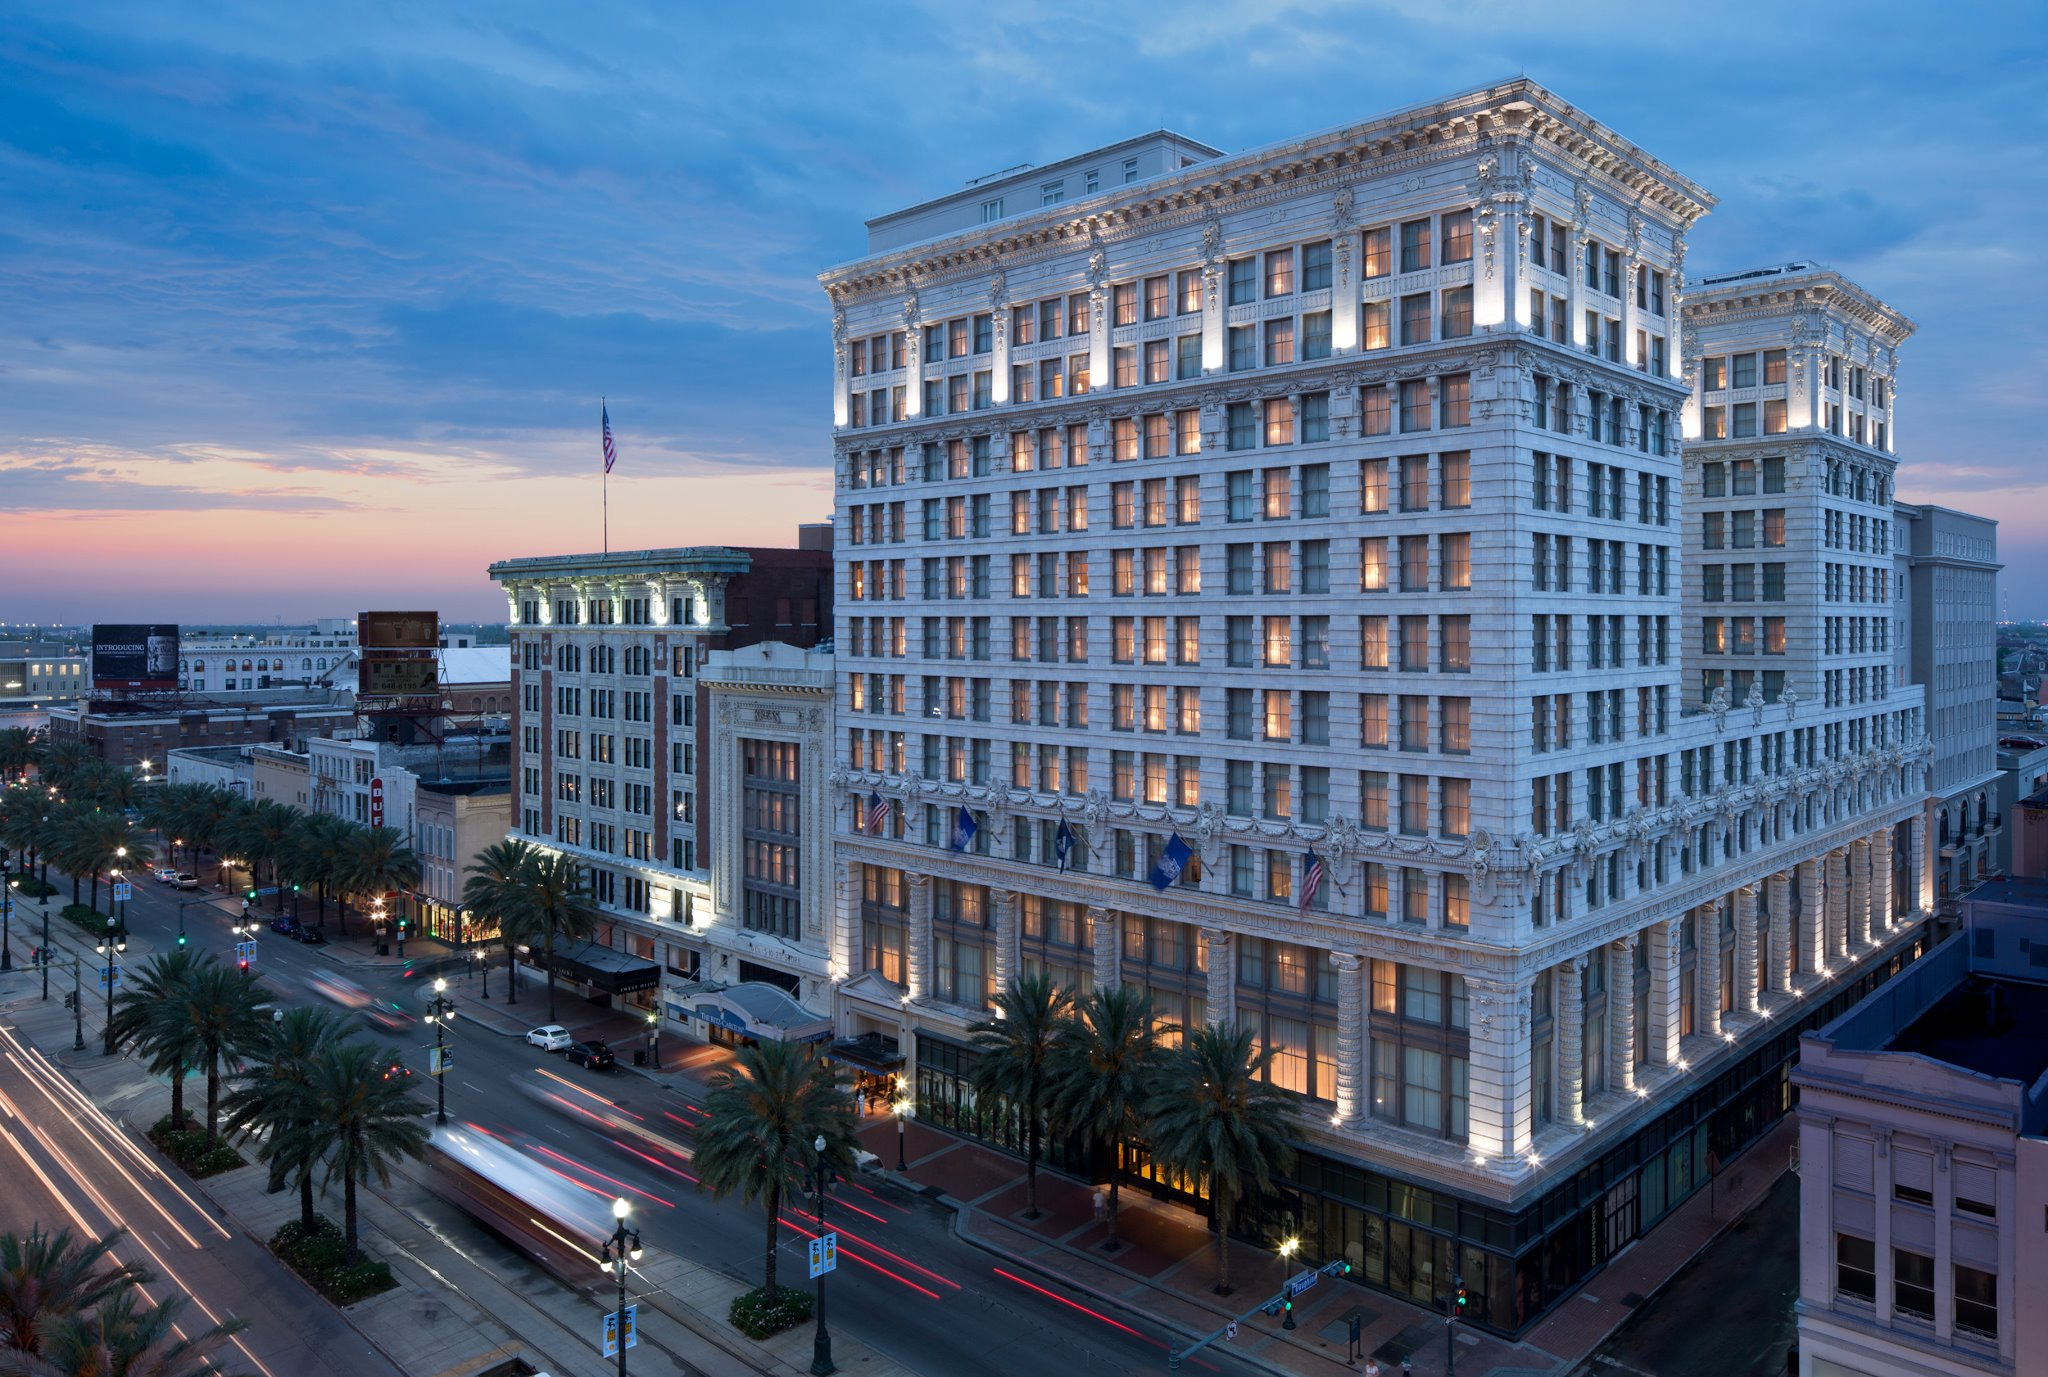 Moonlight Magic at The Ritz-Carlton, New Orleans